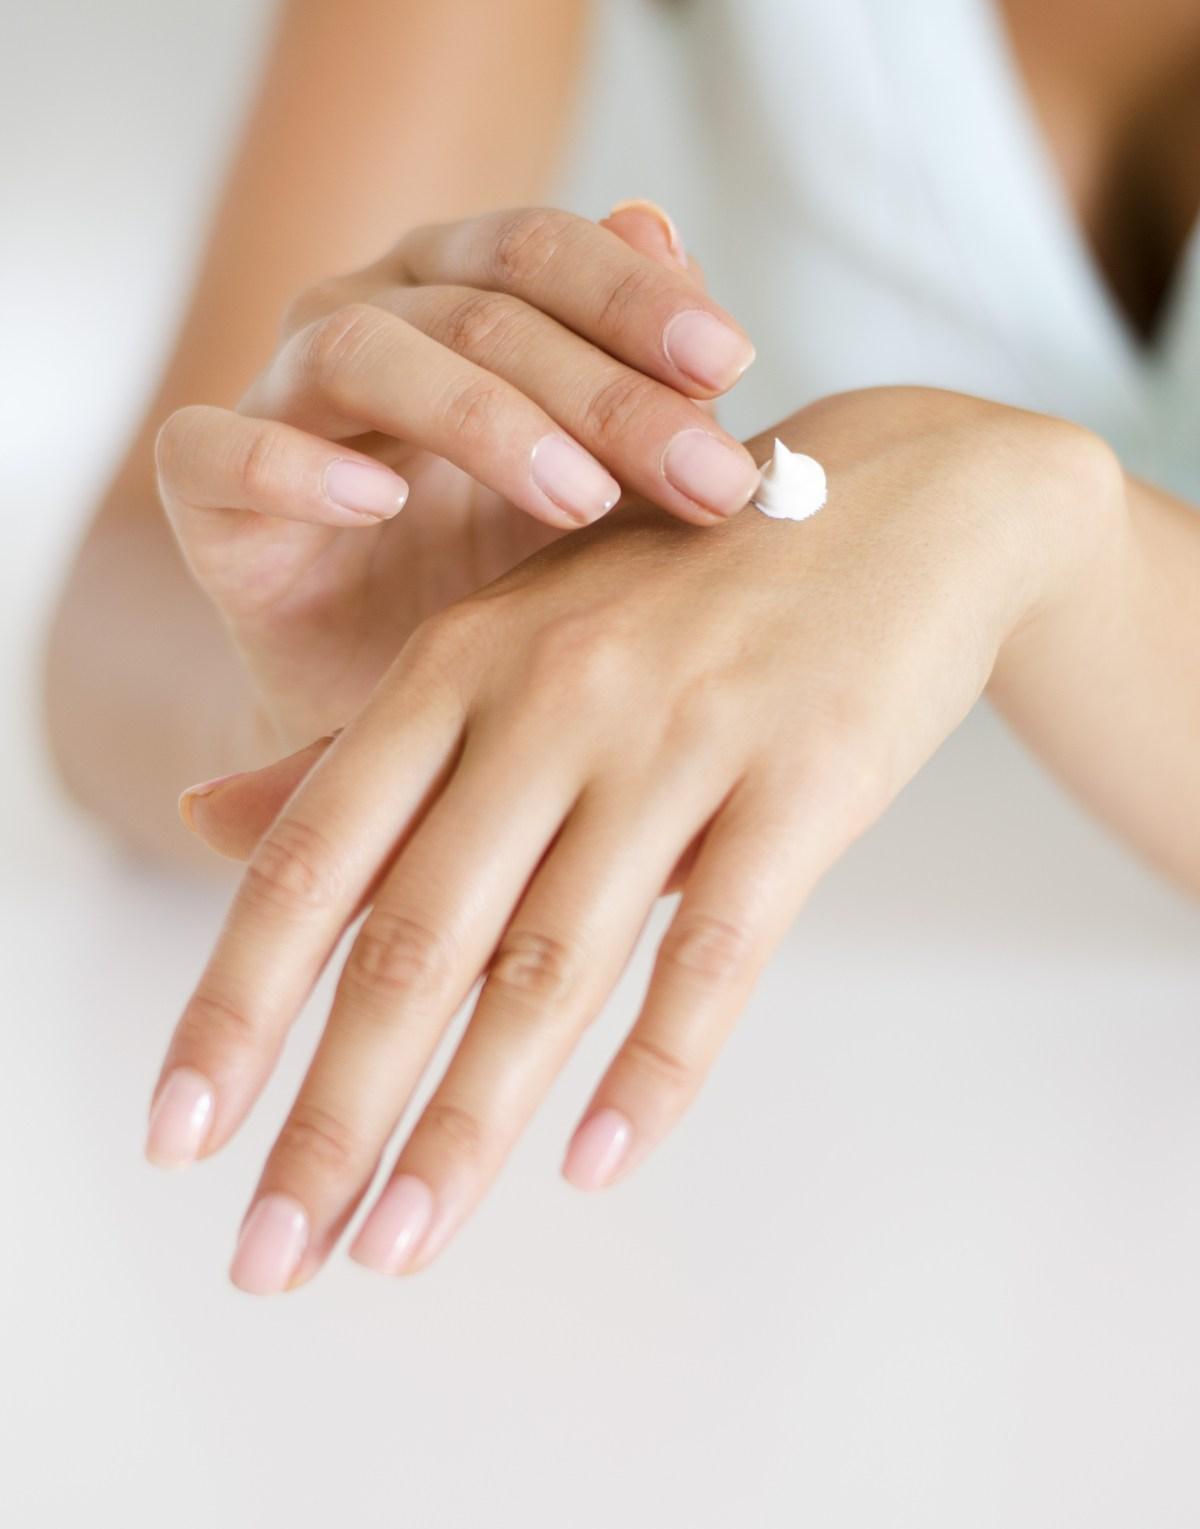 Winter Skincare Tips – Top 5